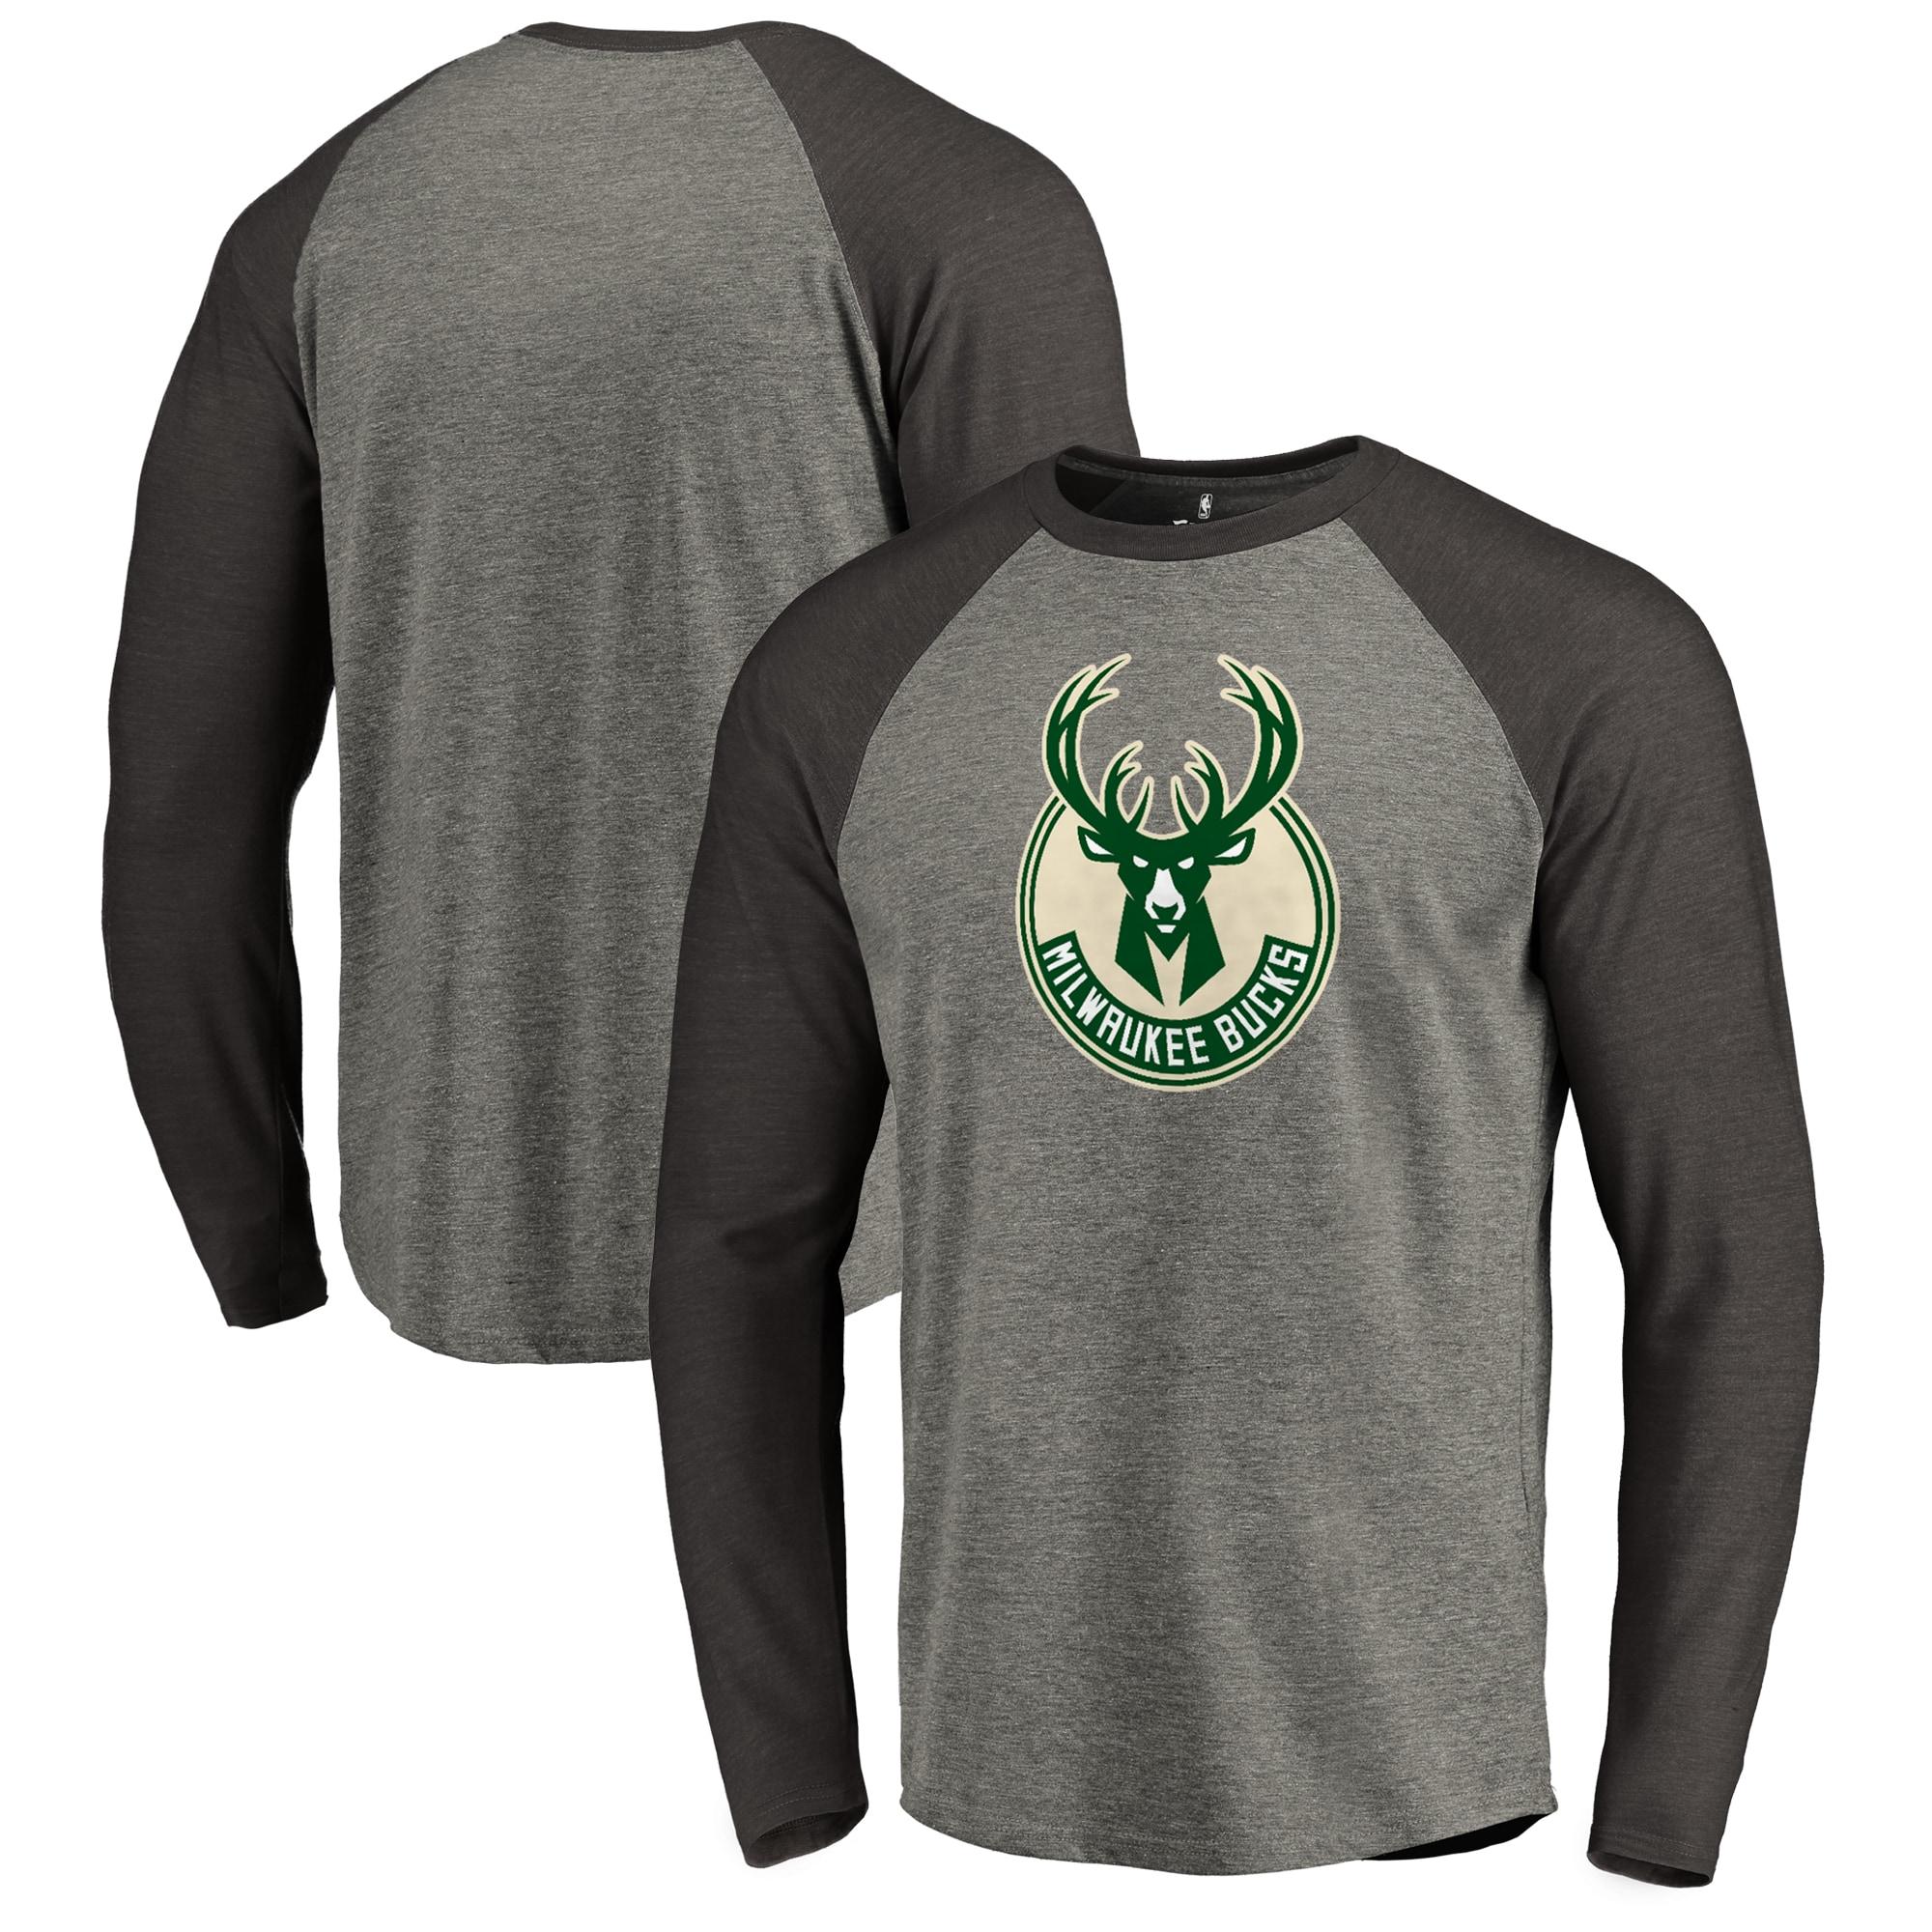 Milwaukee Bucks Fanatics Branded Primary Logo Raglan Long Sleeve T-Shirt - Heathered Gray